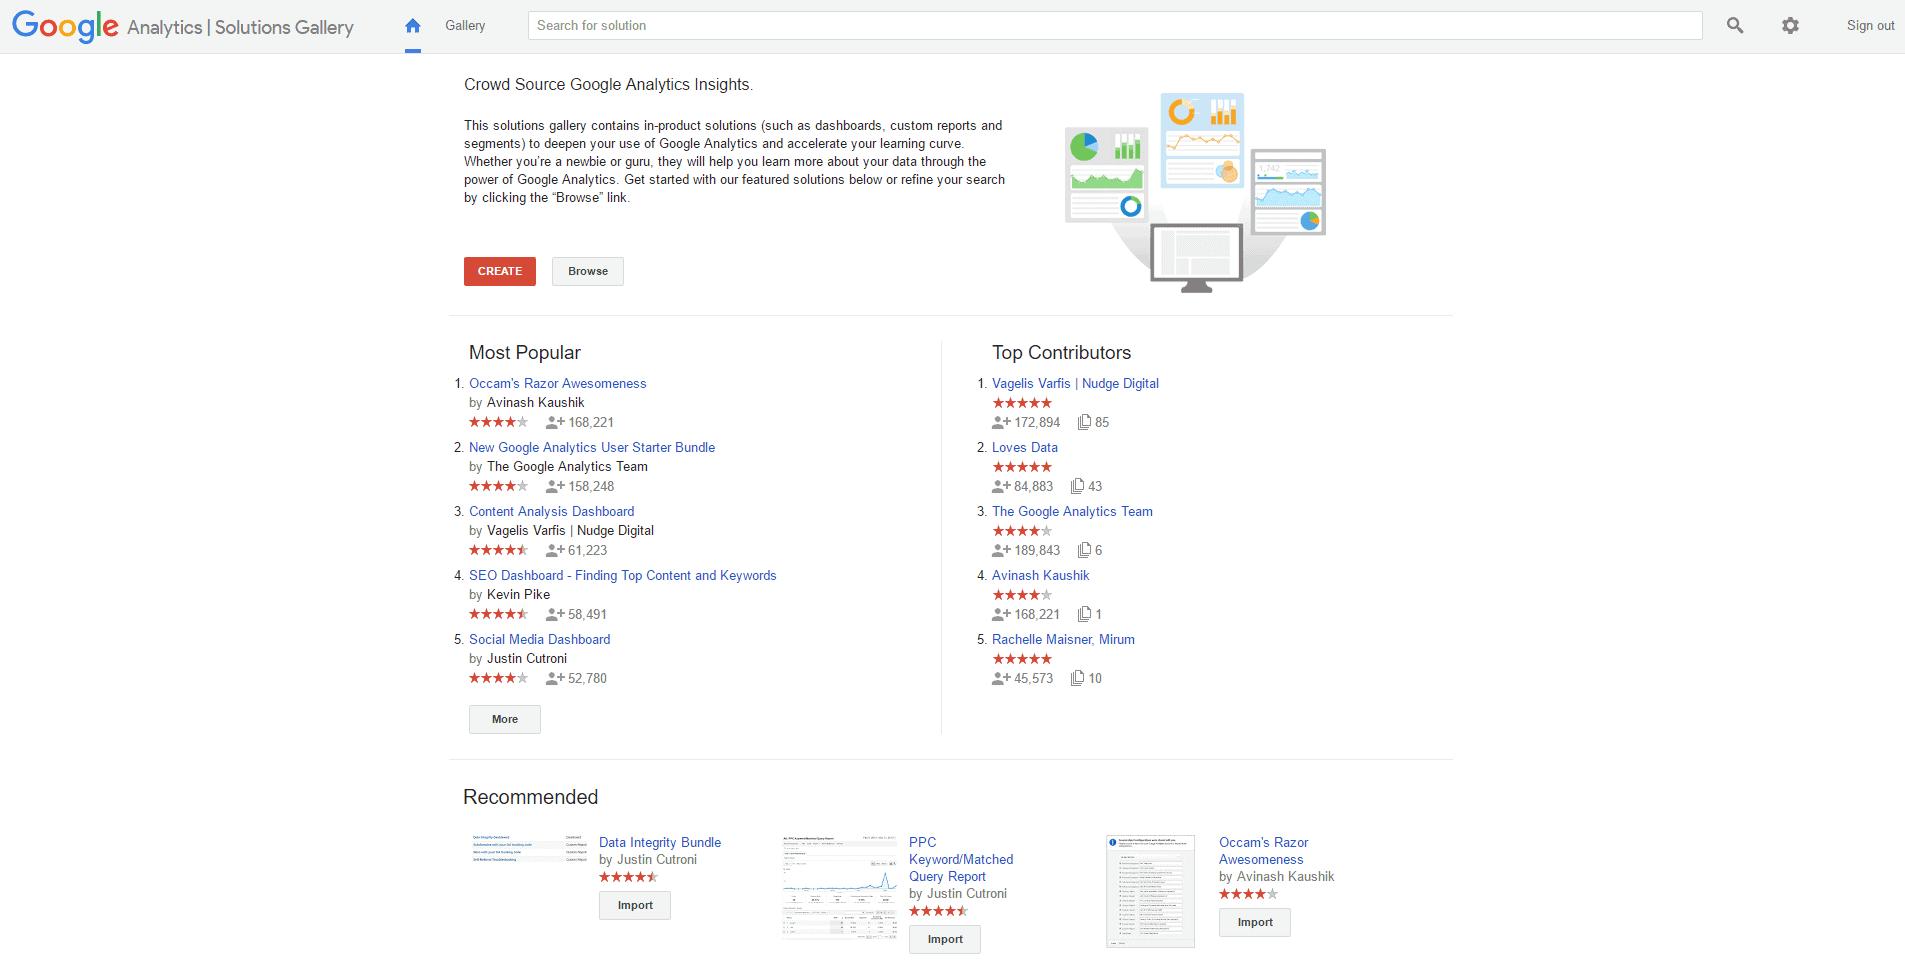 Google Analytics Solutions Gallery